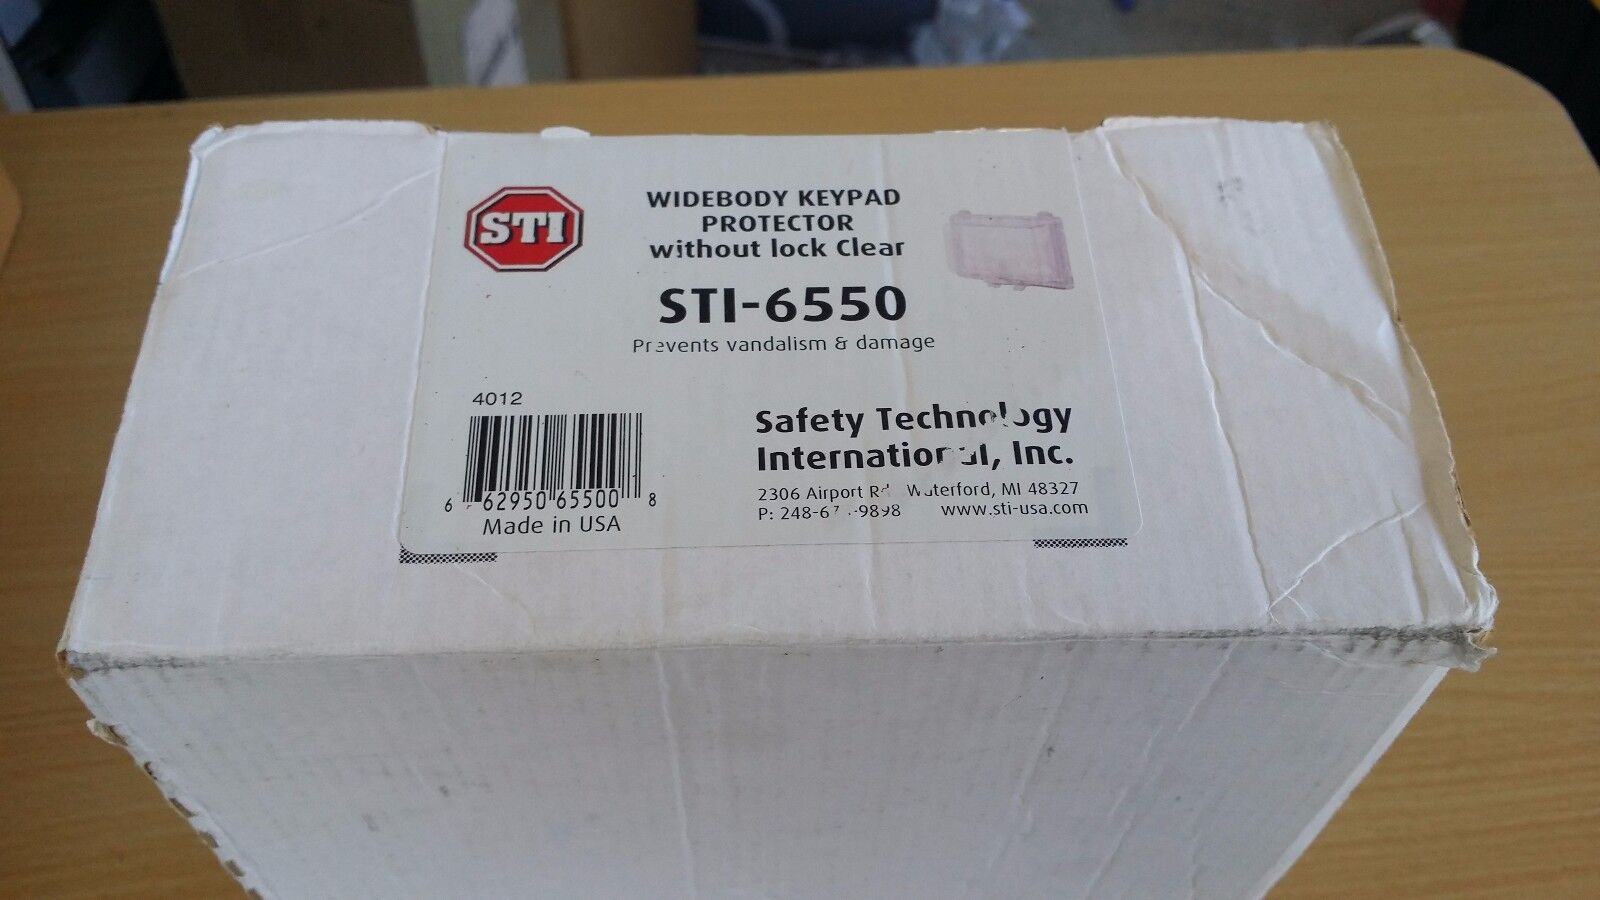 STI-6550 Widebody Keypad protector without lock Prevents vandalism & damage